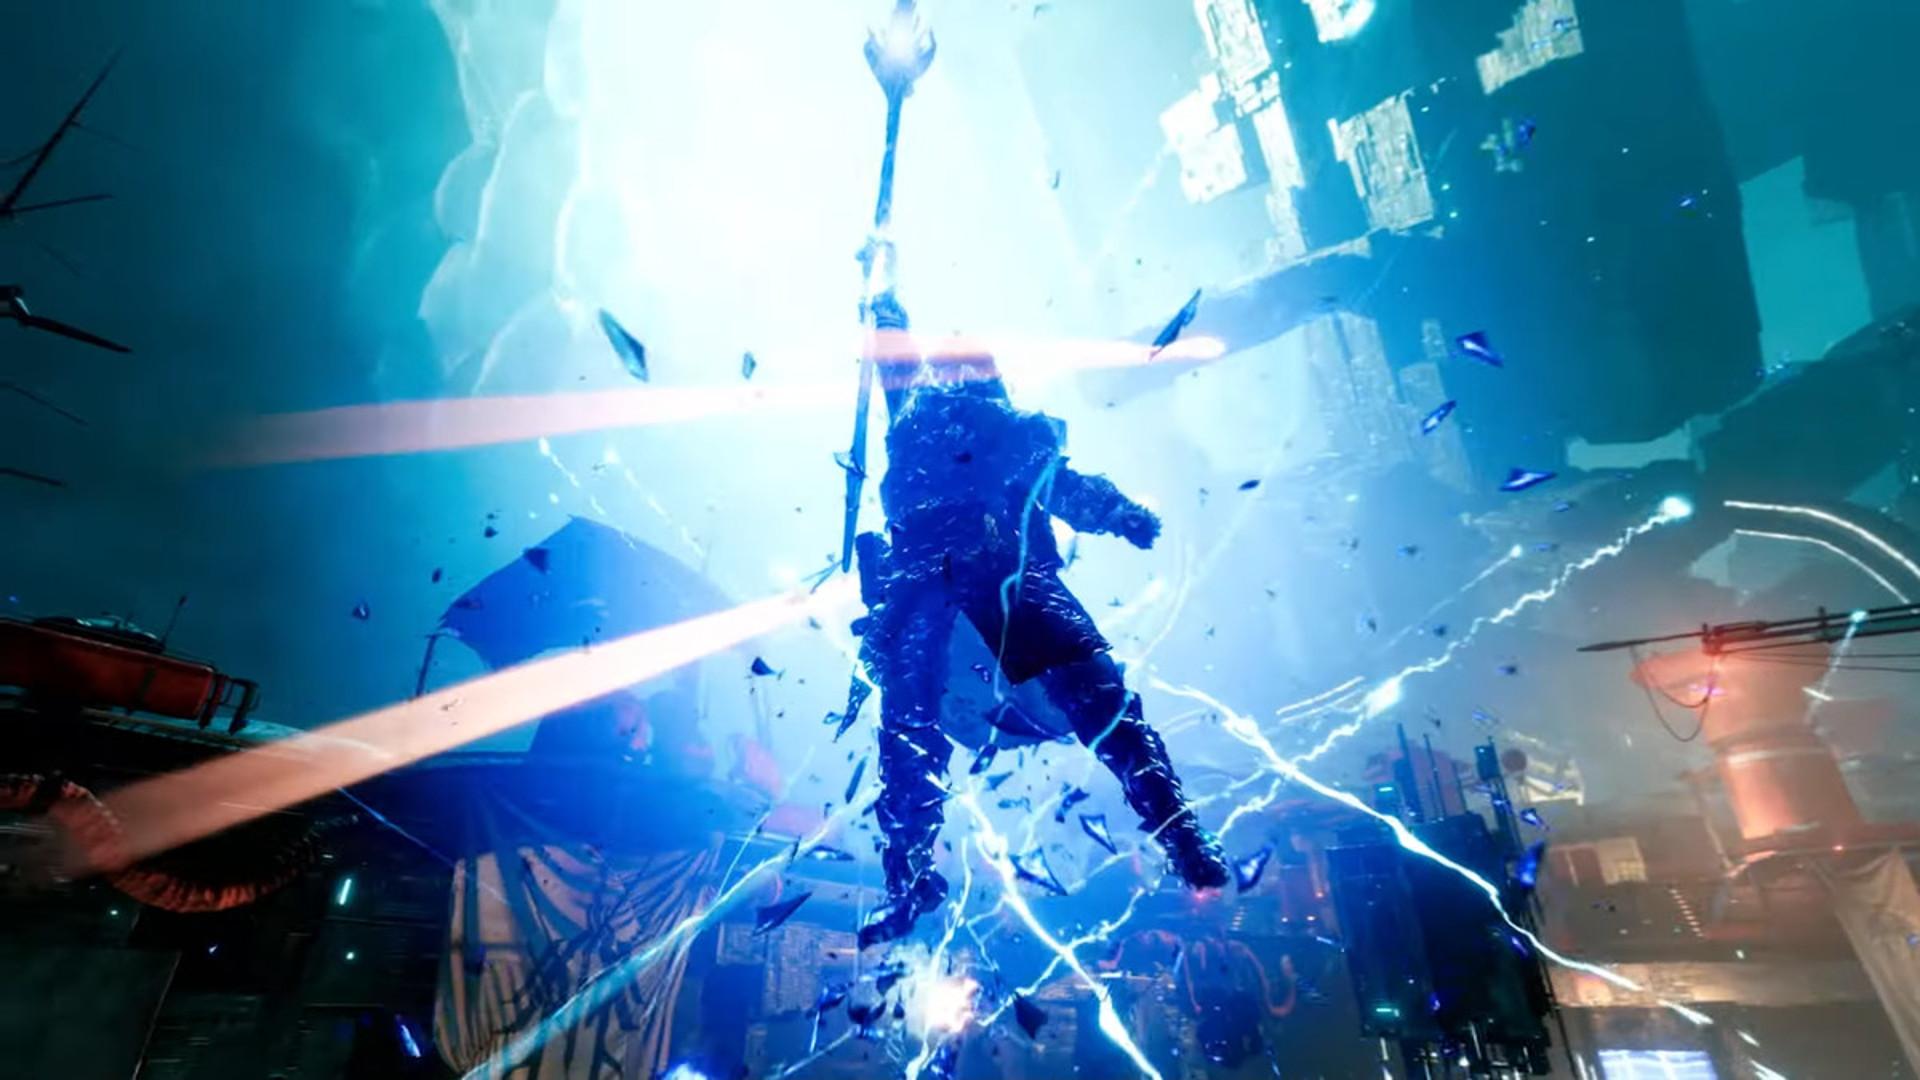 Destiny 2's infinite super glitch has returned